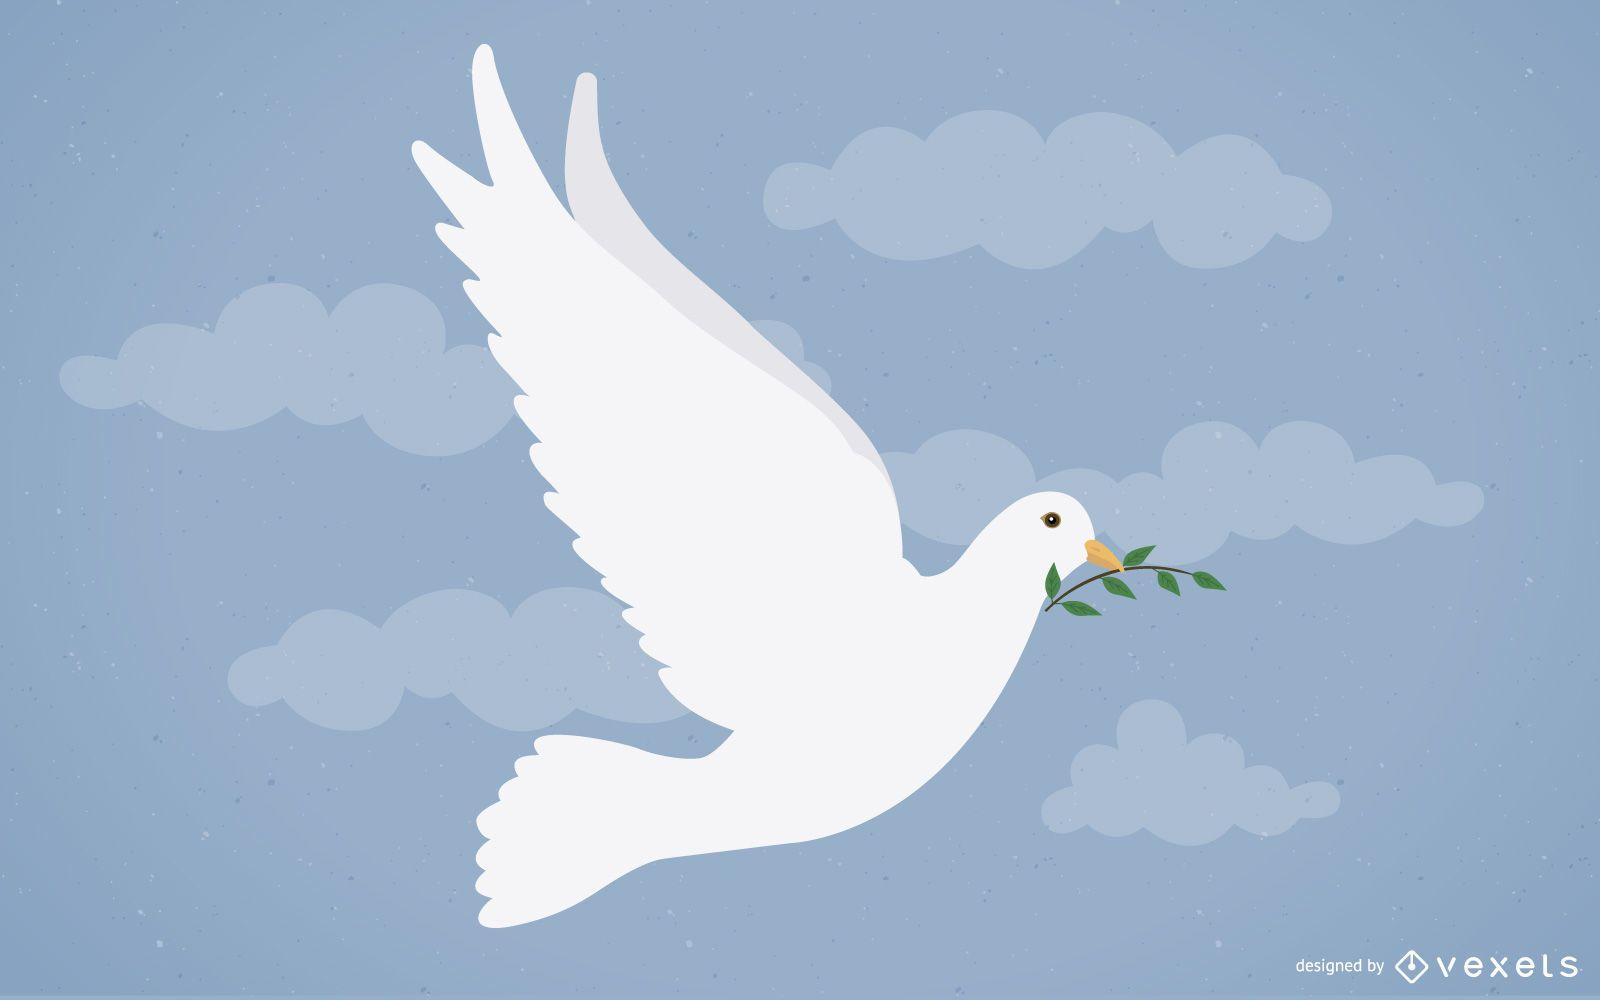 The Freedom Bird Illustration